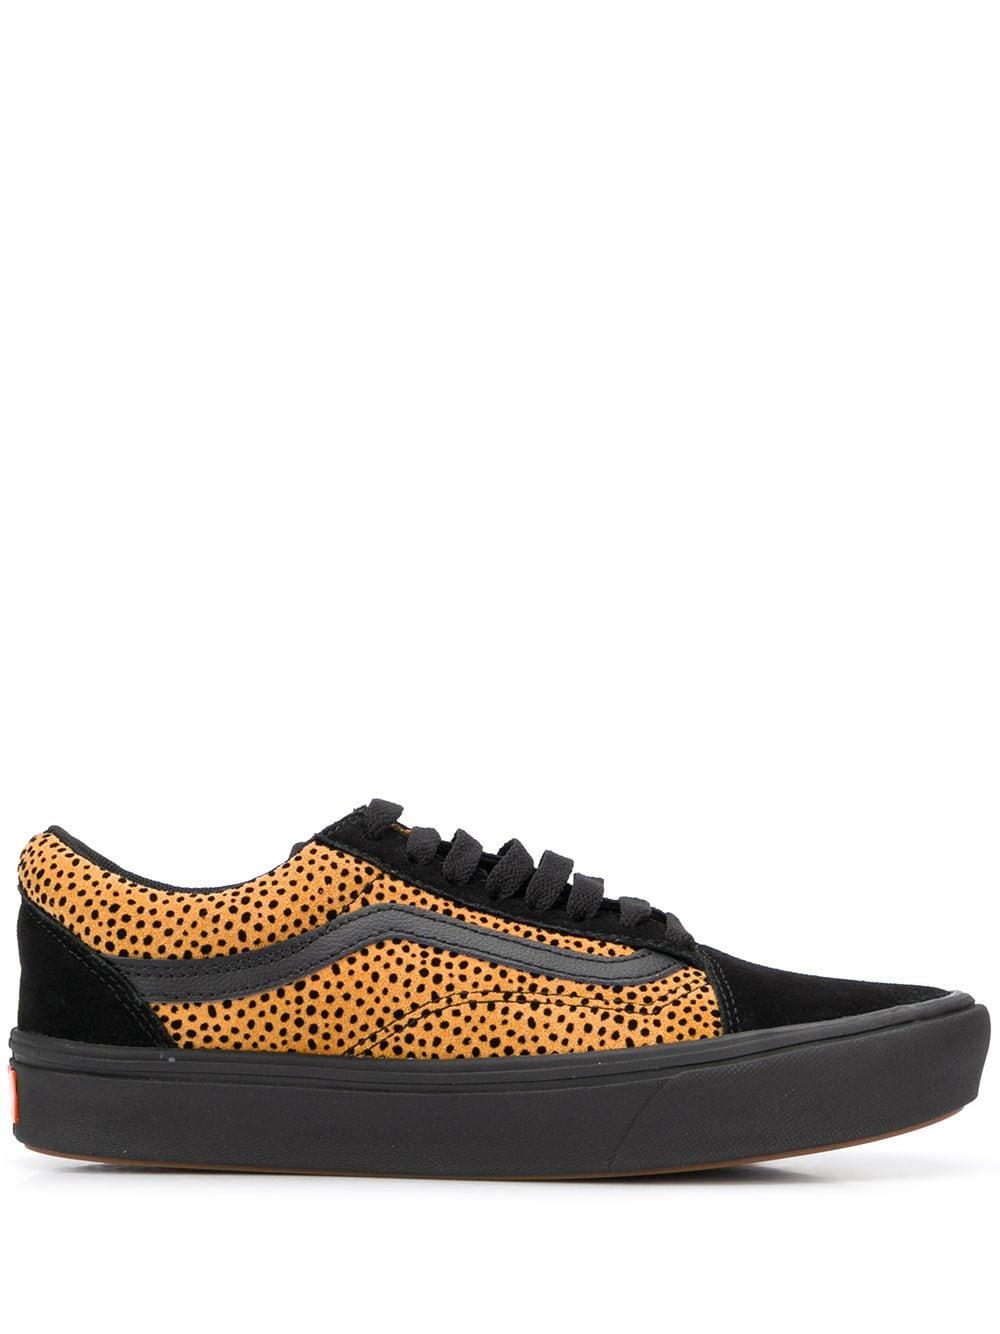 Vans ComfyCush Old Skool low-top sneakers – Zwart